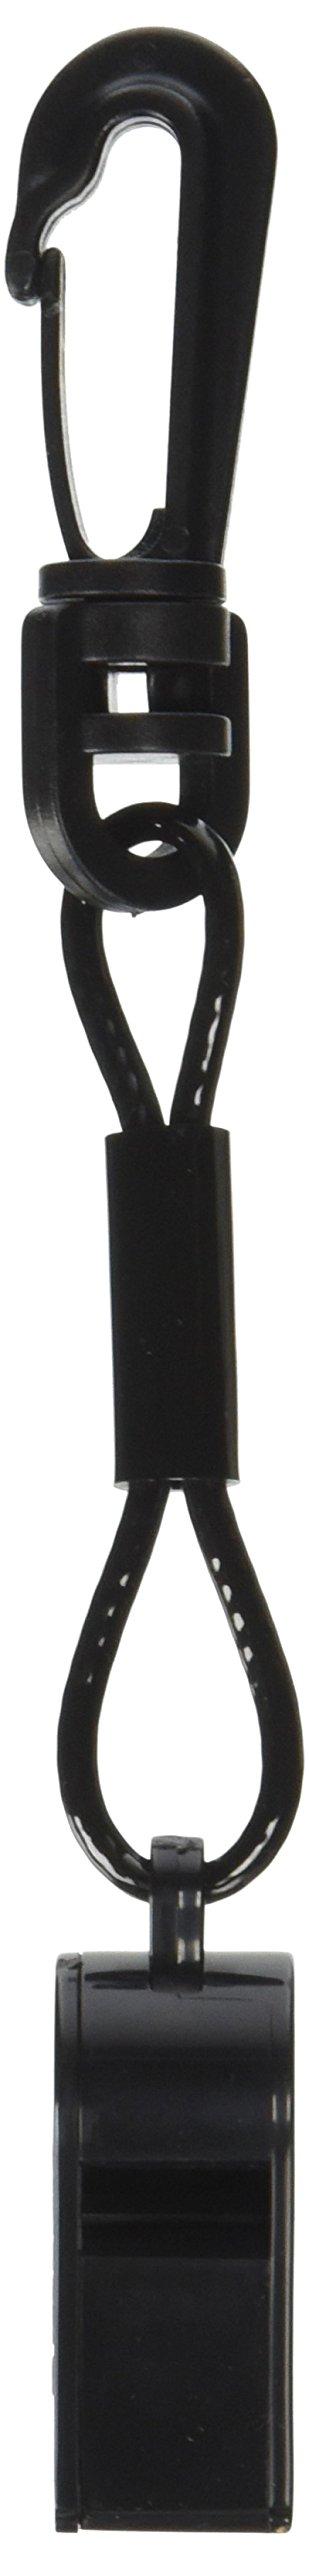 Atlantis A2700-C Black Whistle with Clip